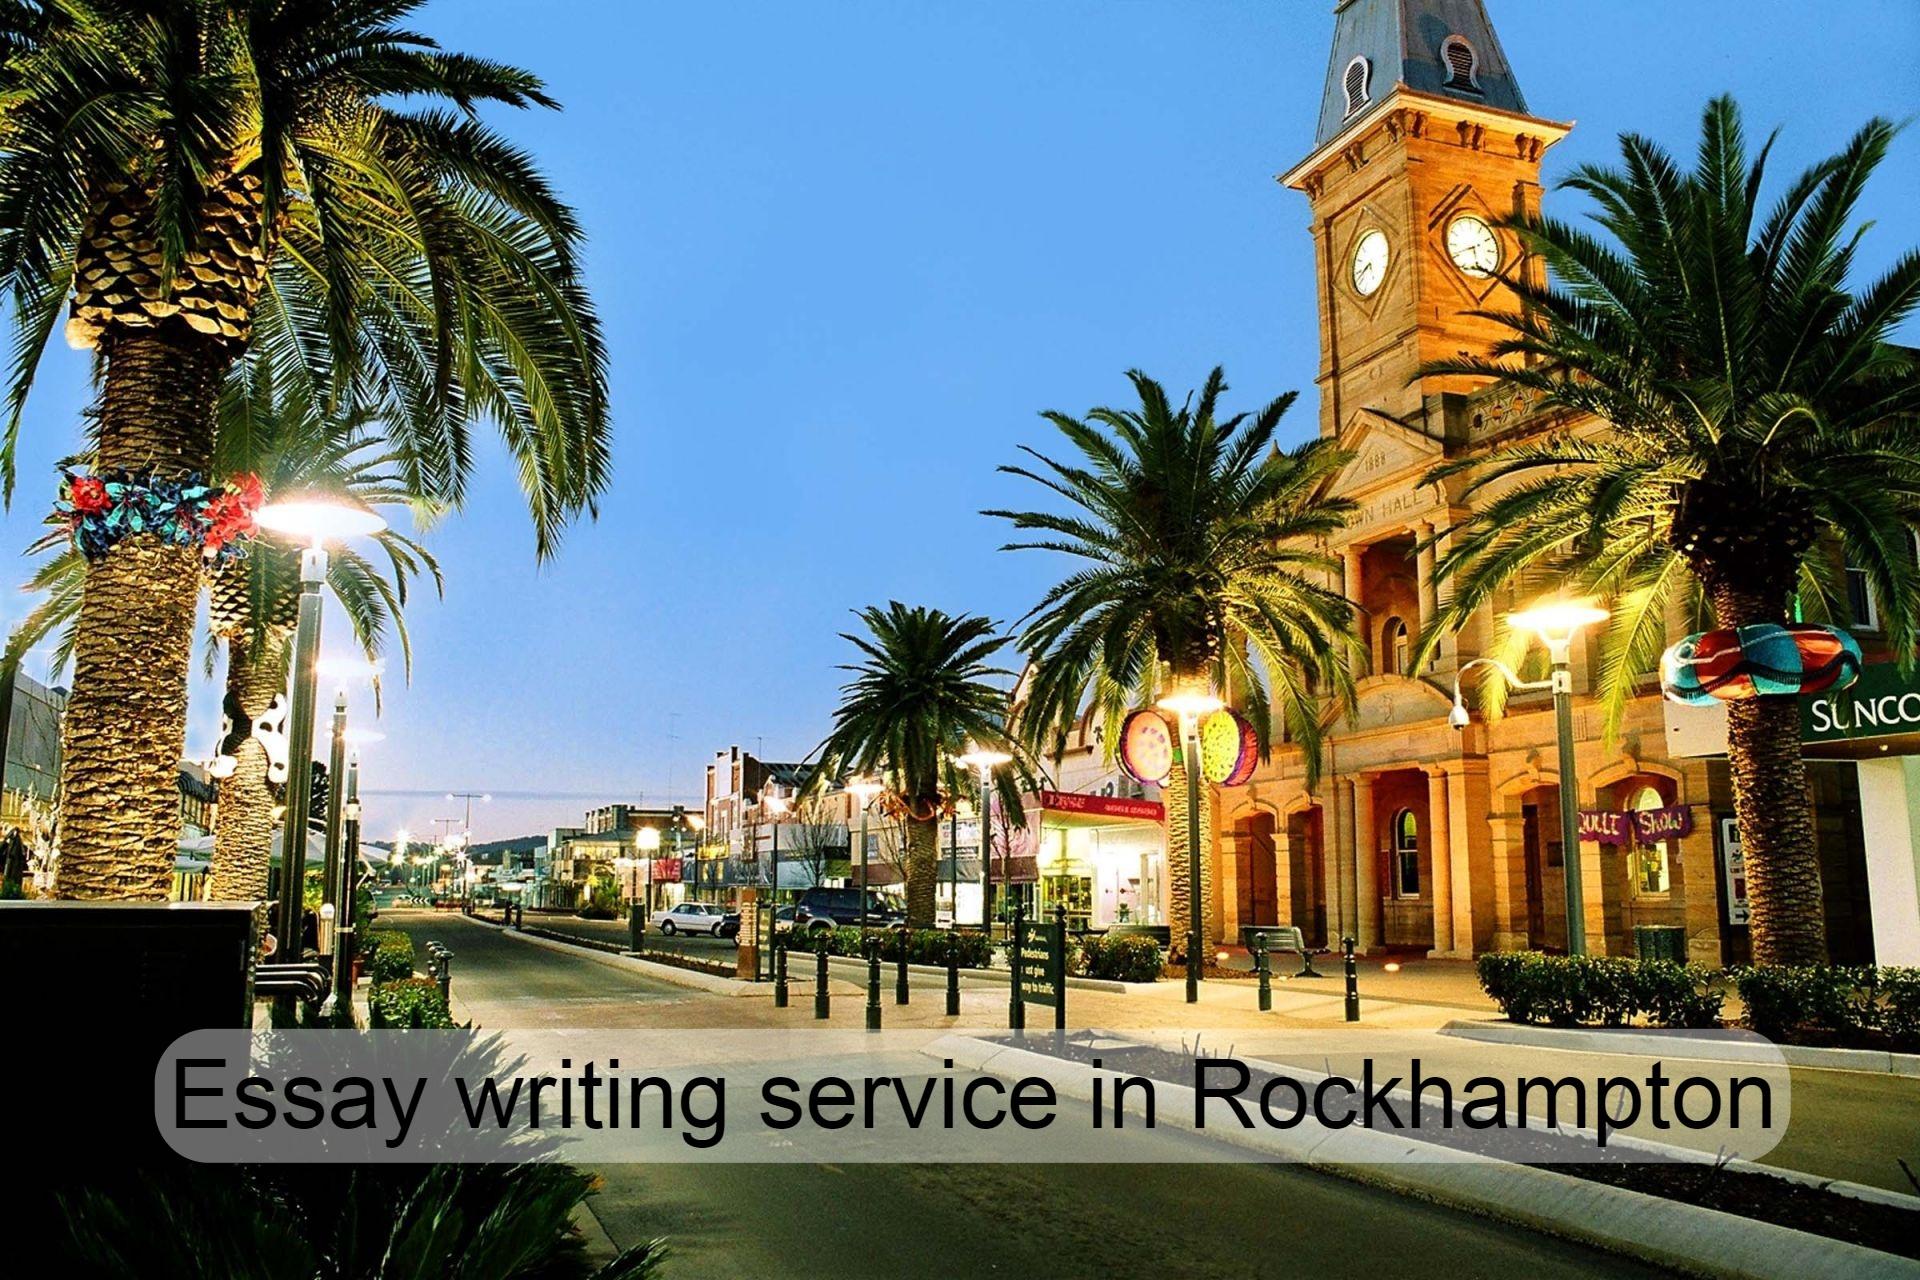 Essay writing service in Rockhampton